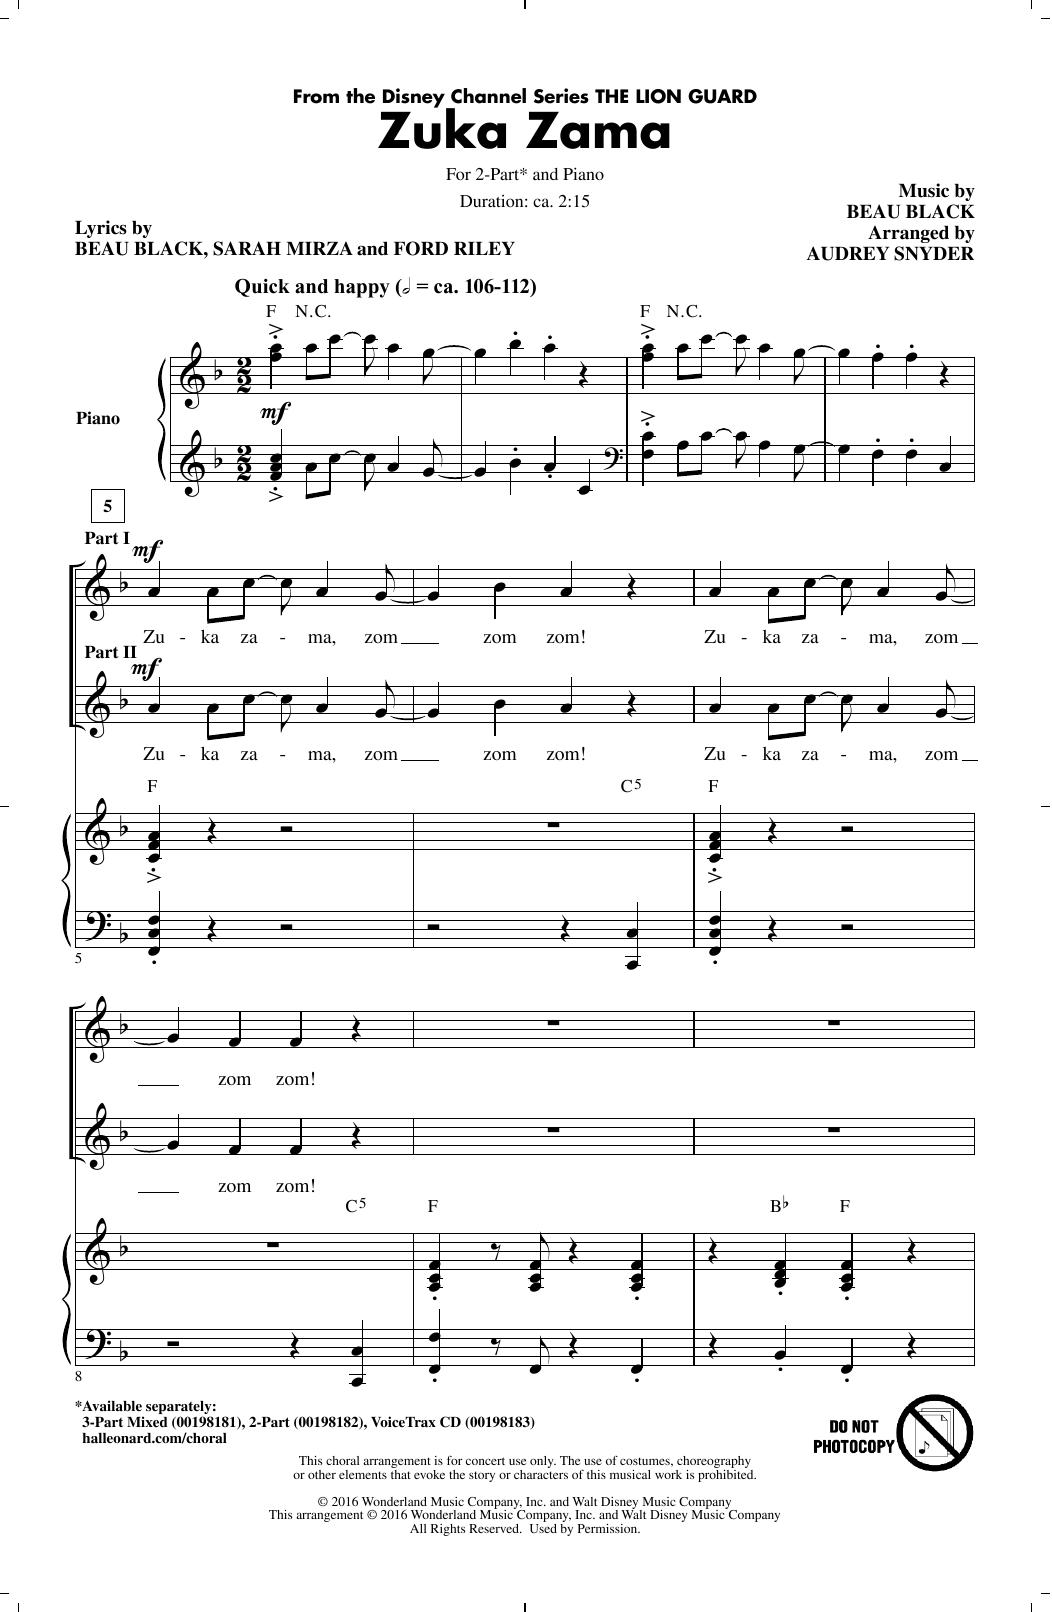 Audrey Snyder Zuka Zama sheet music notes and chords. Download Printable PDF.